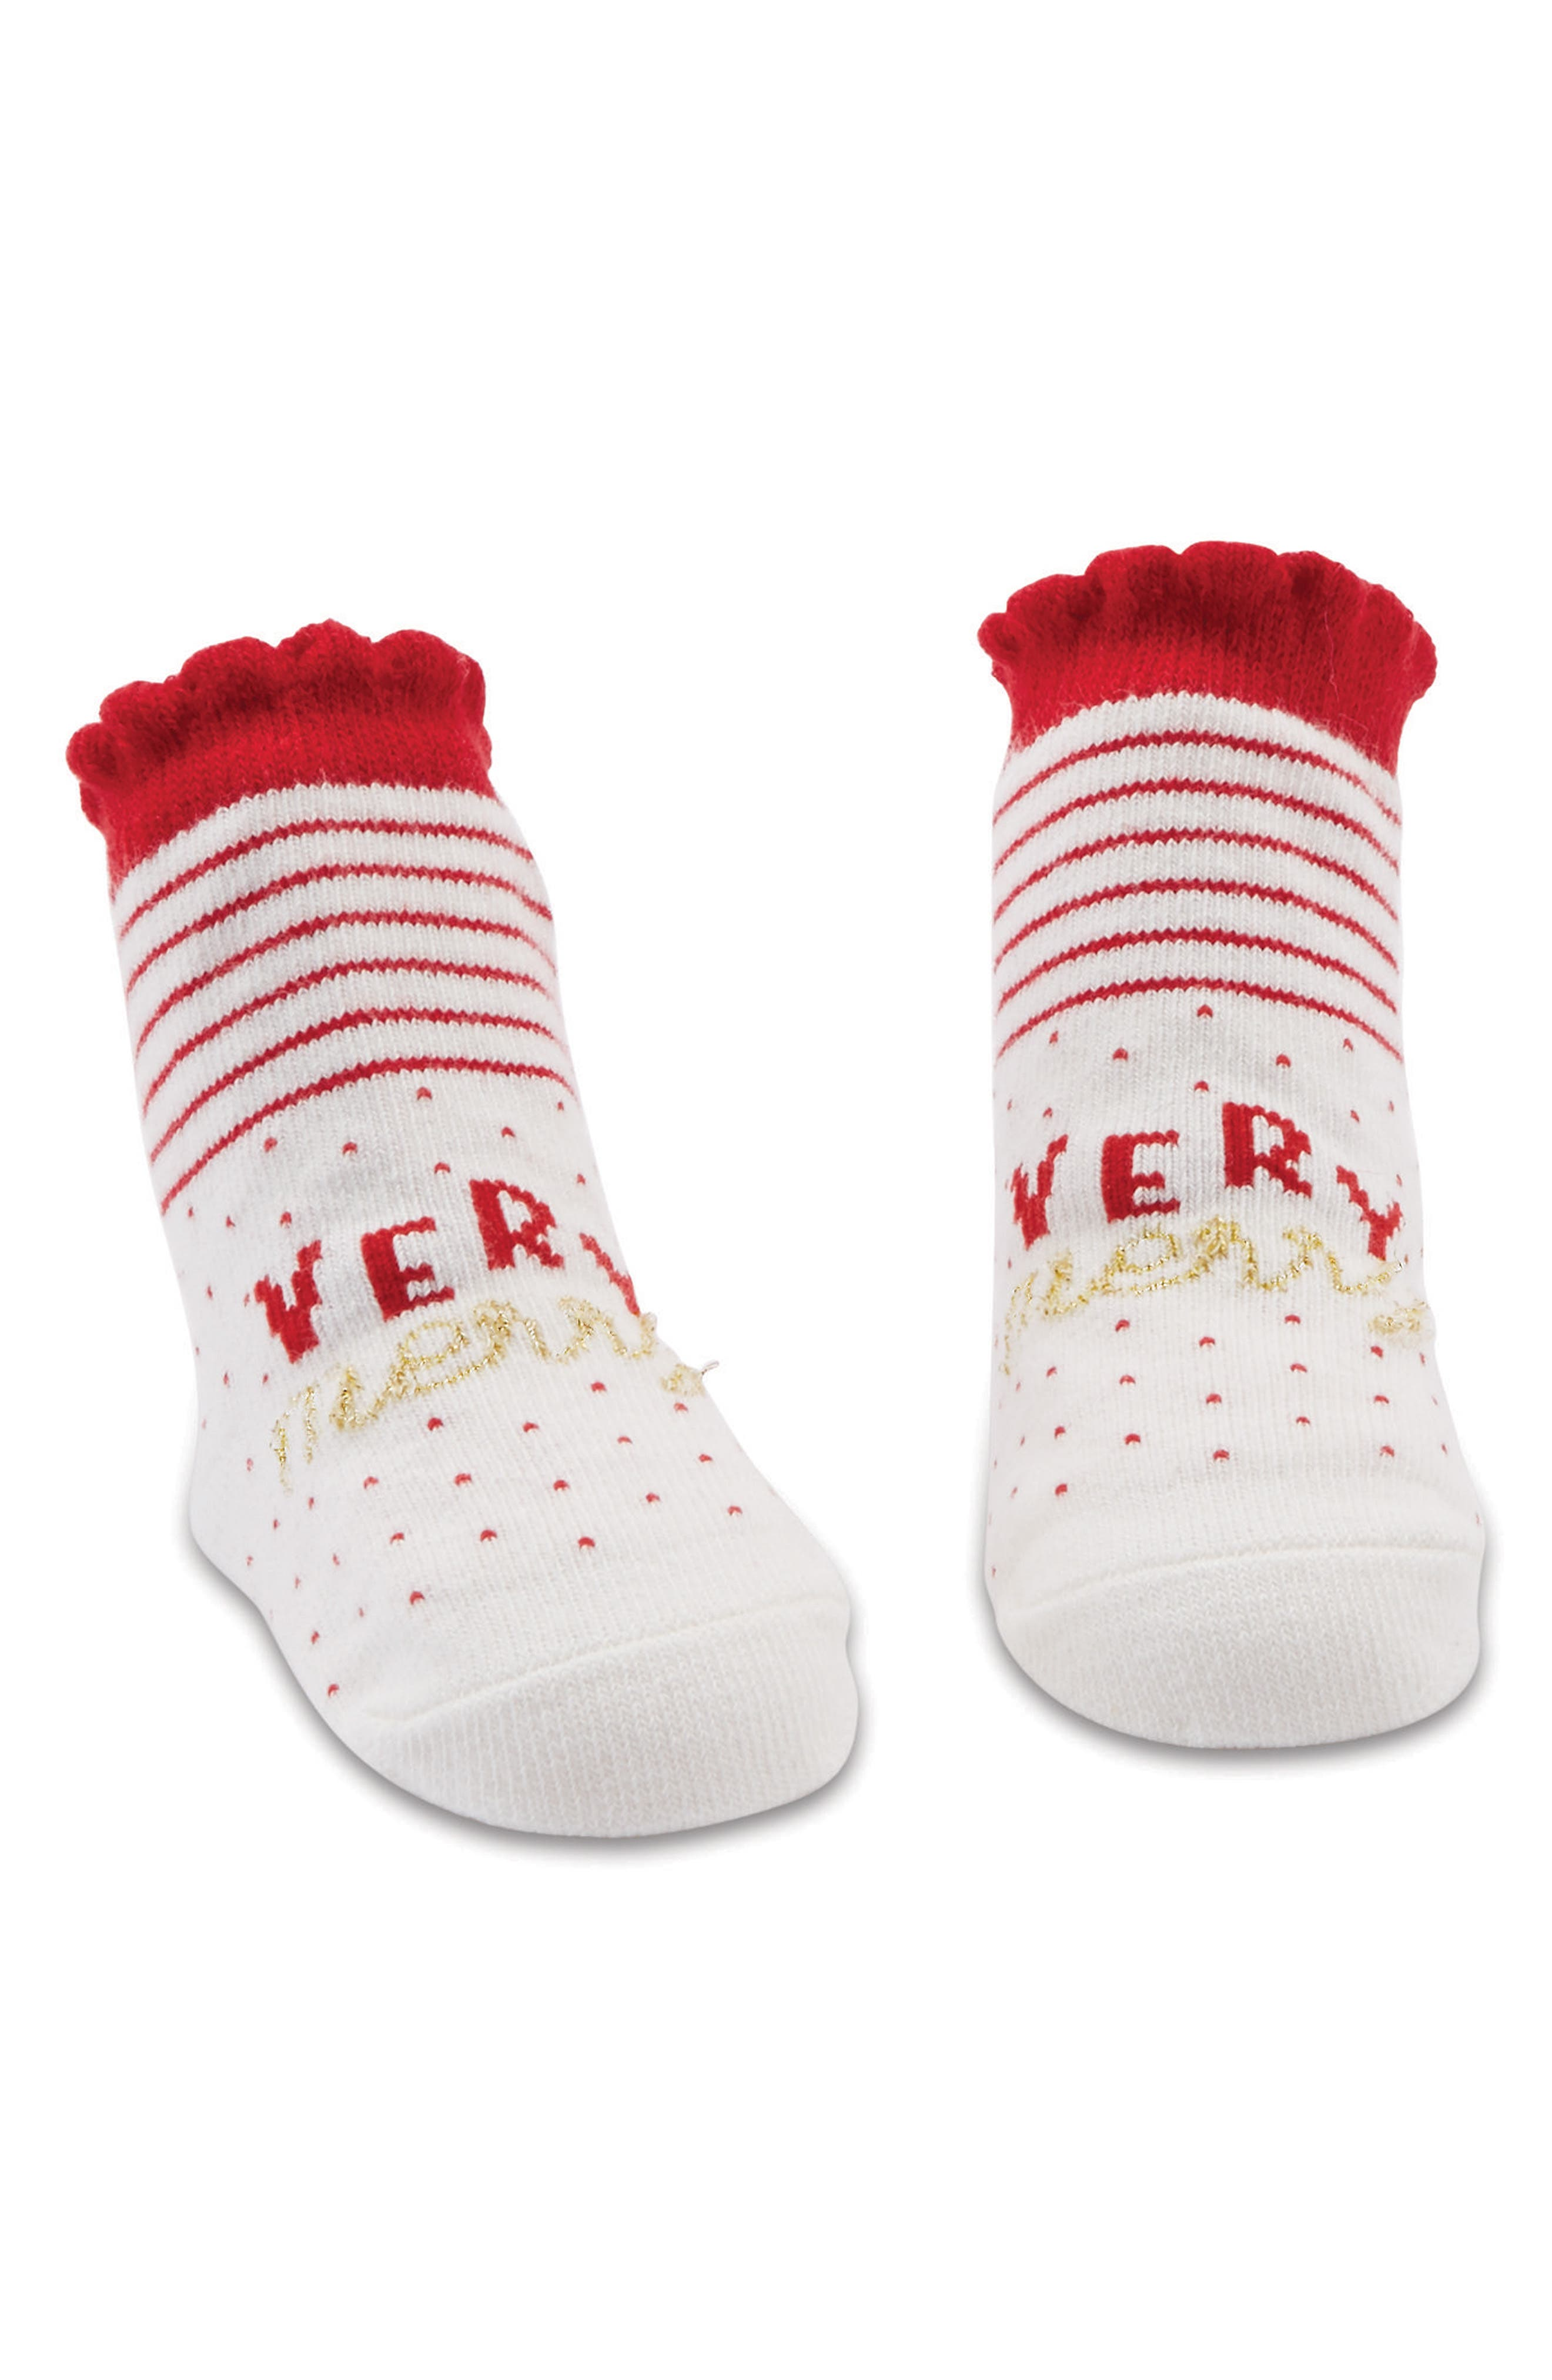 Very Merry Socks,                         Main,                         color,